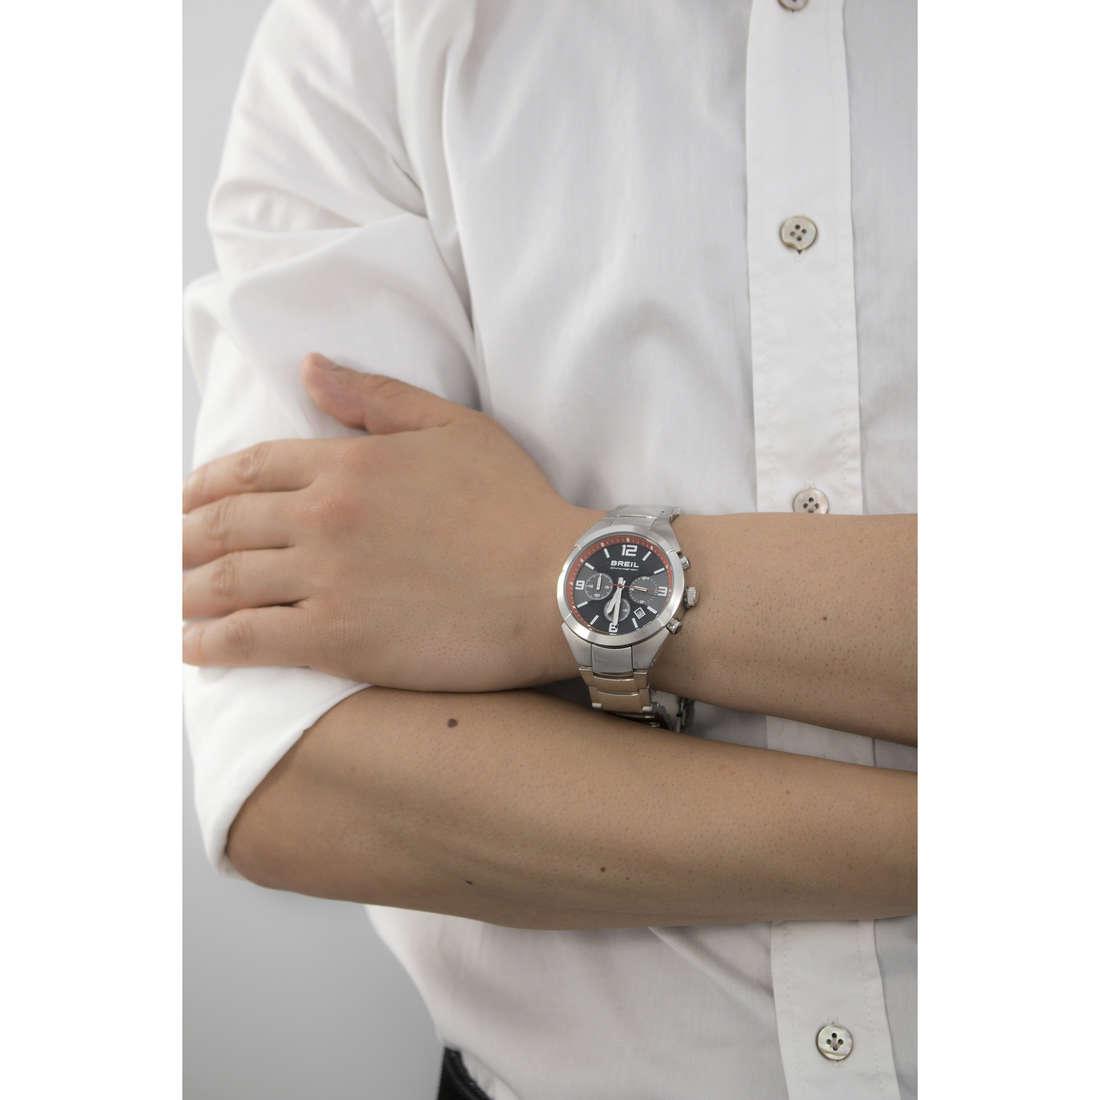 Breil cronografi Gap uomo TW1381 indosso